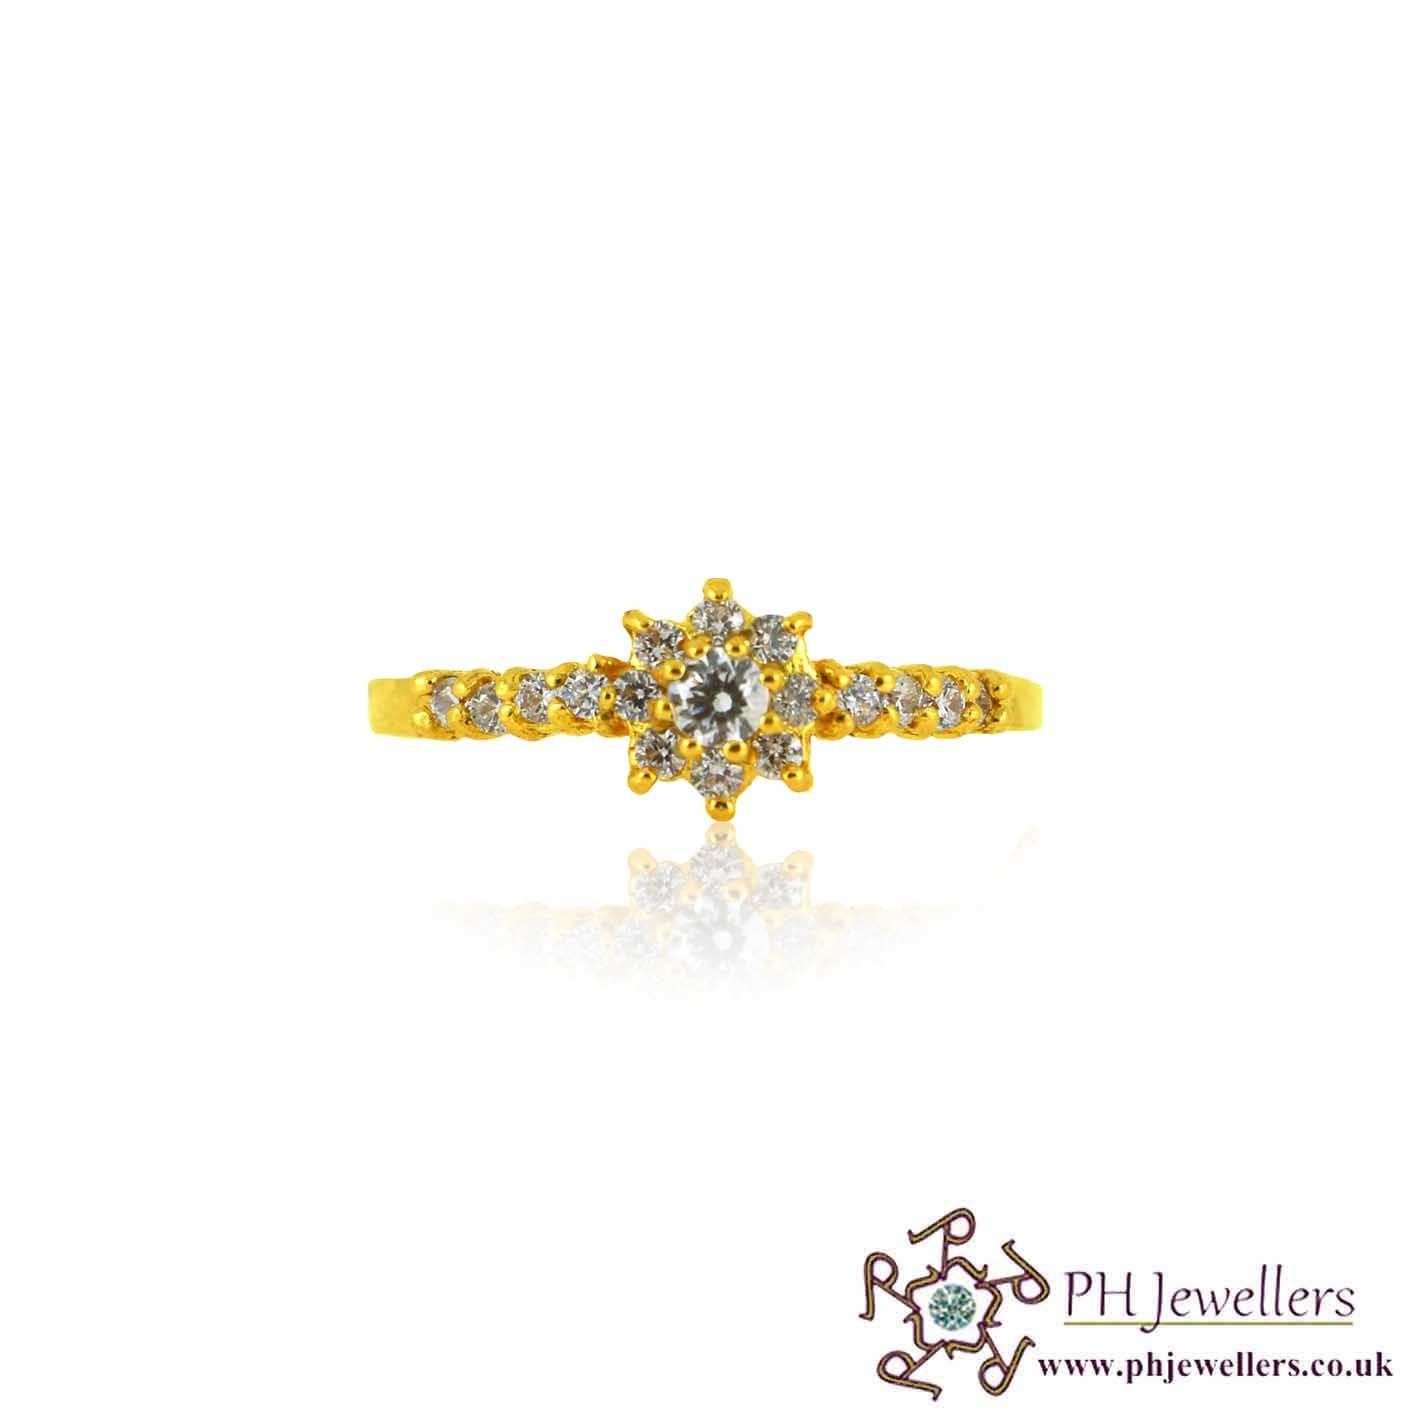 22ct 916 Hallmark Yellow Gold  White Stone Ring Size N CZ SR157